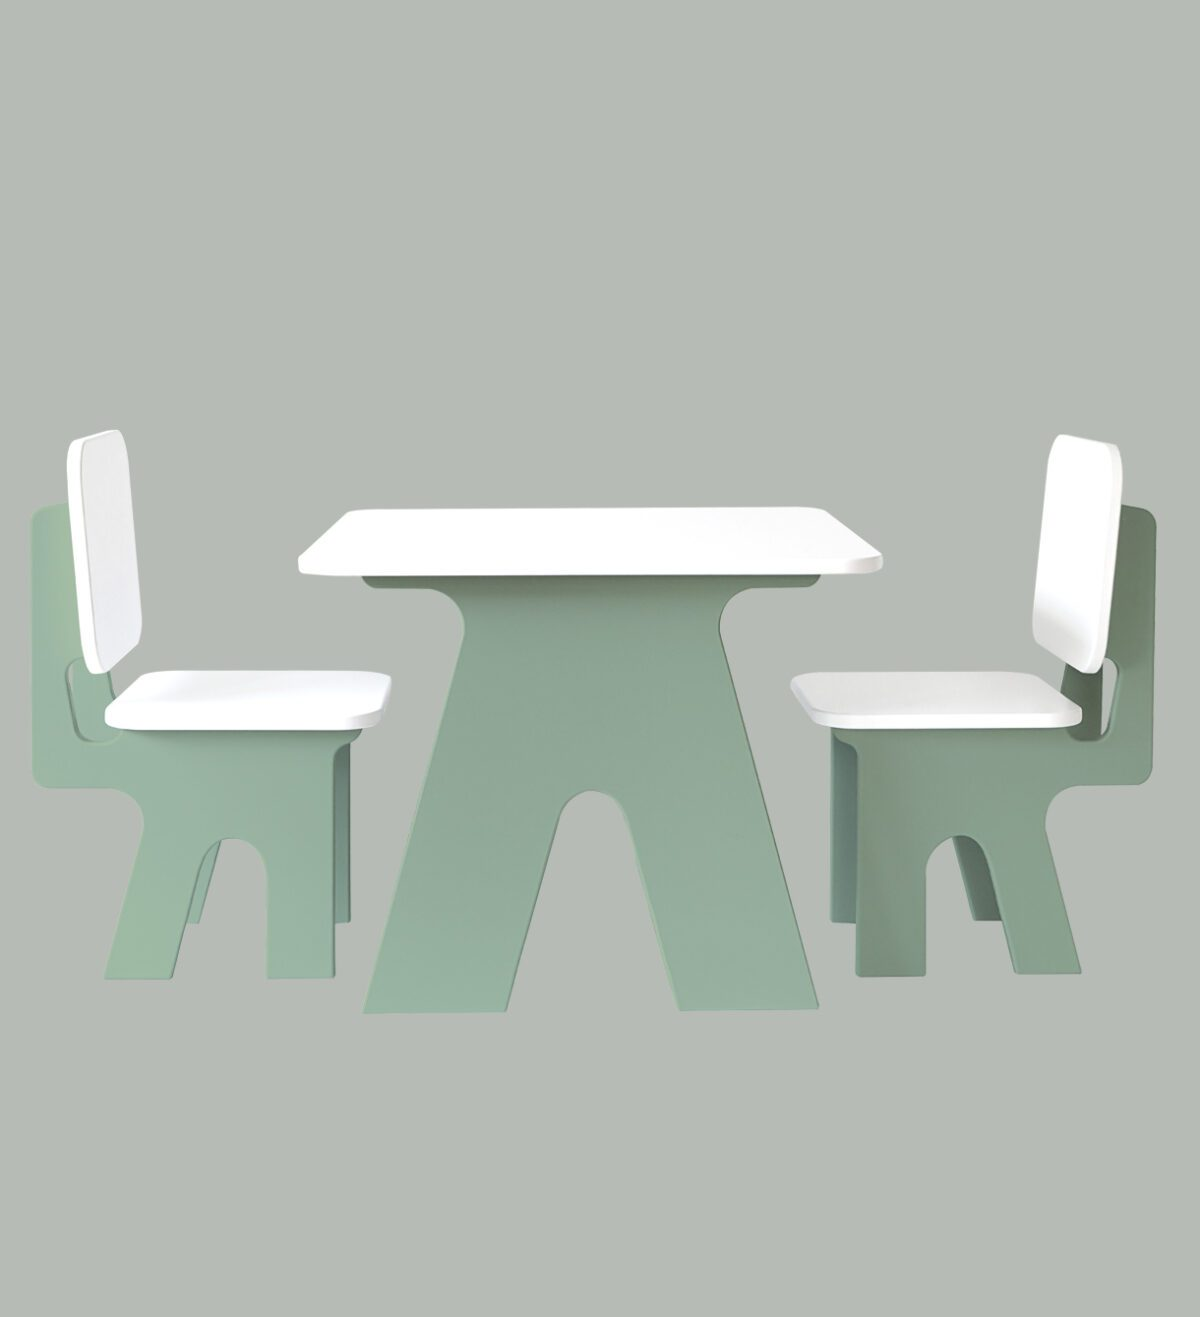 Kinderstoeltjes met tafel Dipperdee groe